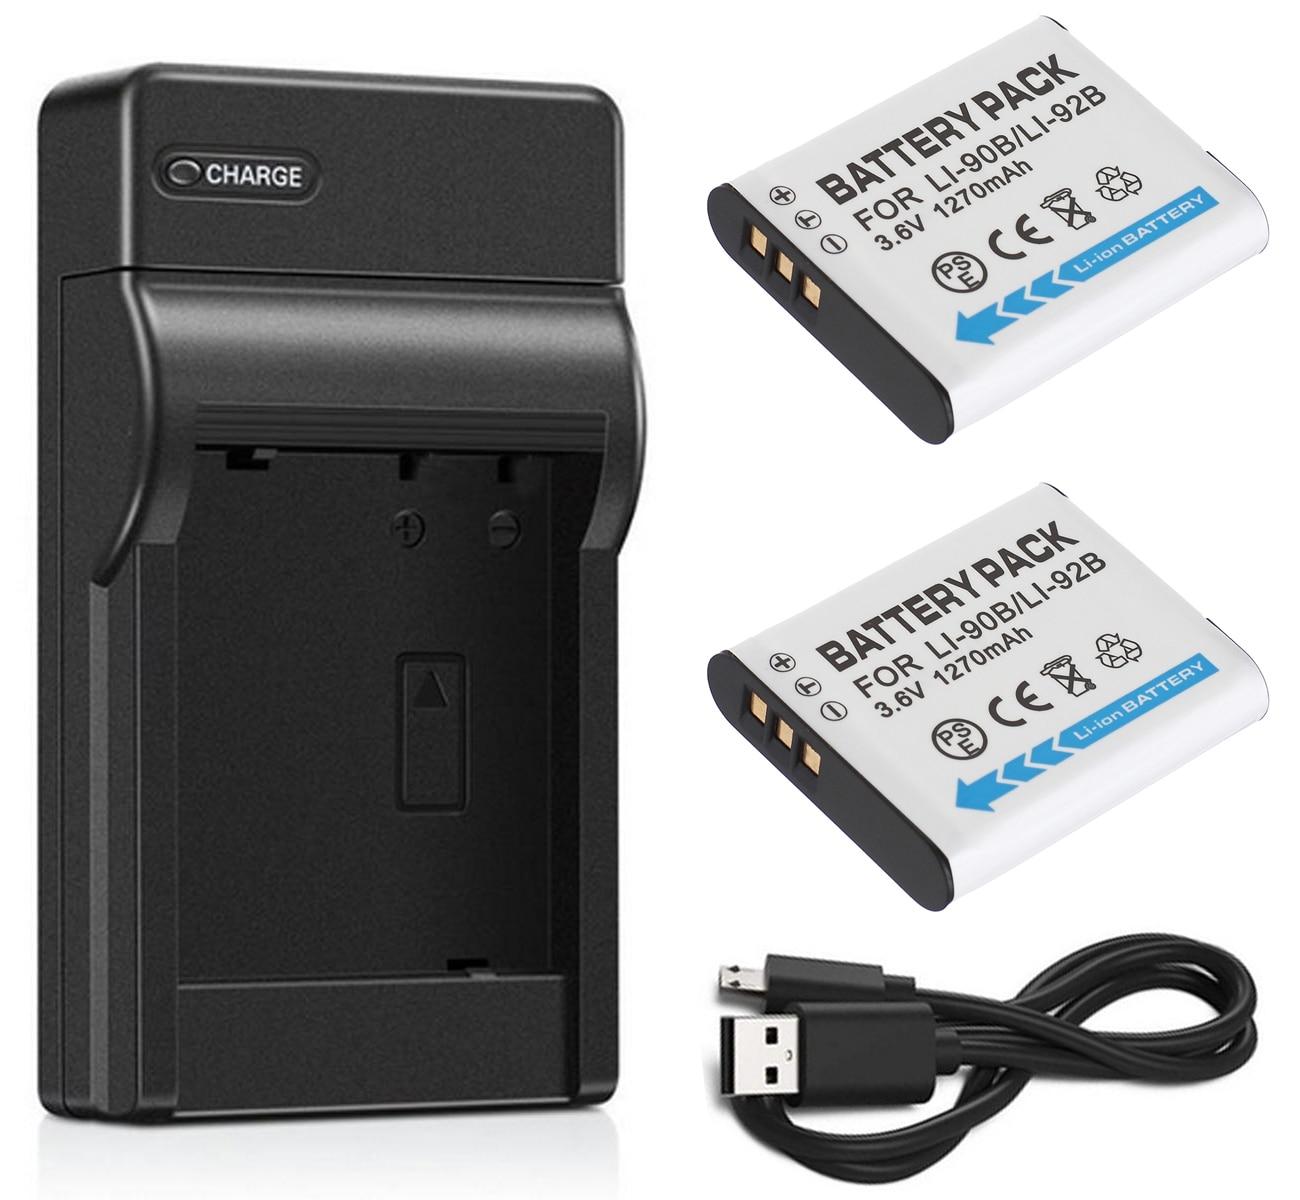 Batería (paquete de 2) + cargador para Ricoh DB-110, DB110 y Ricoh GR III, GRIII, GR3, GR-3, G900, G900SE, WG-6, WG6 cámara Digital